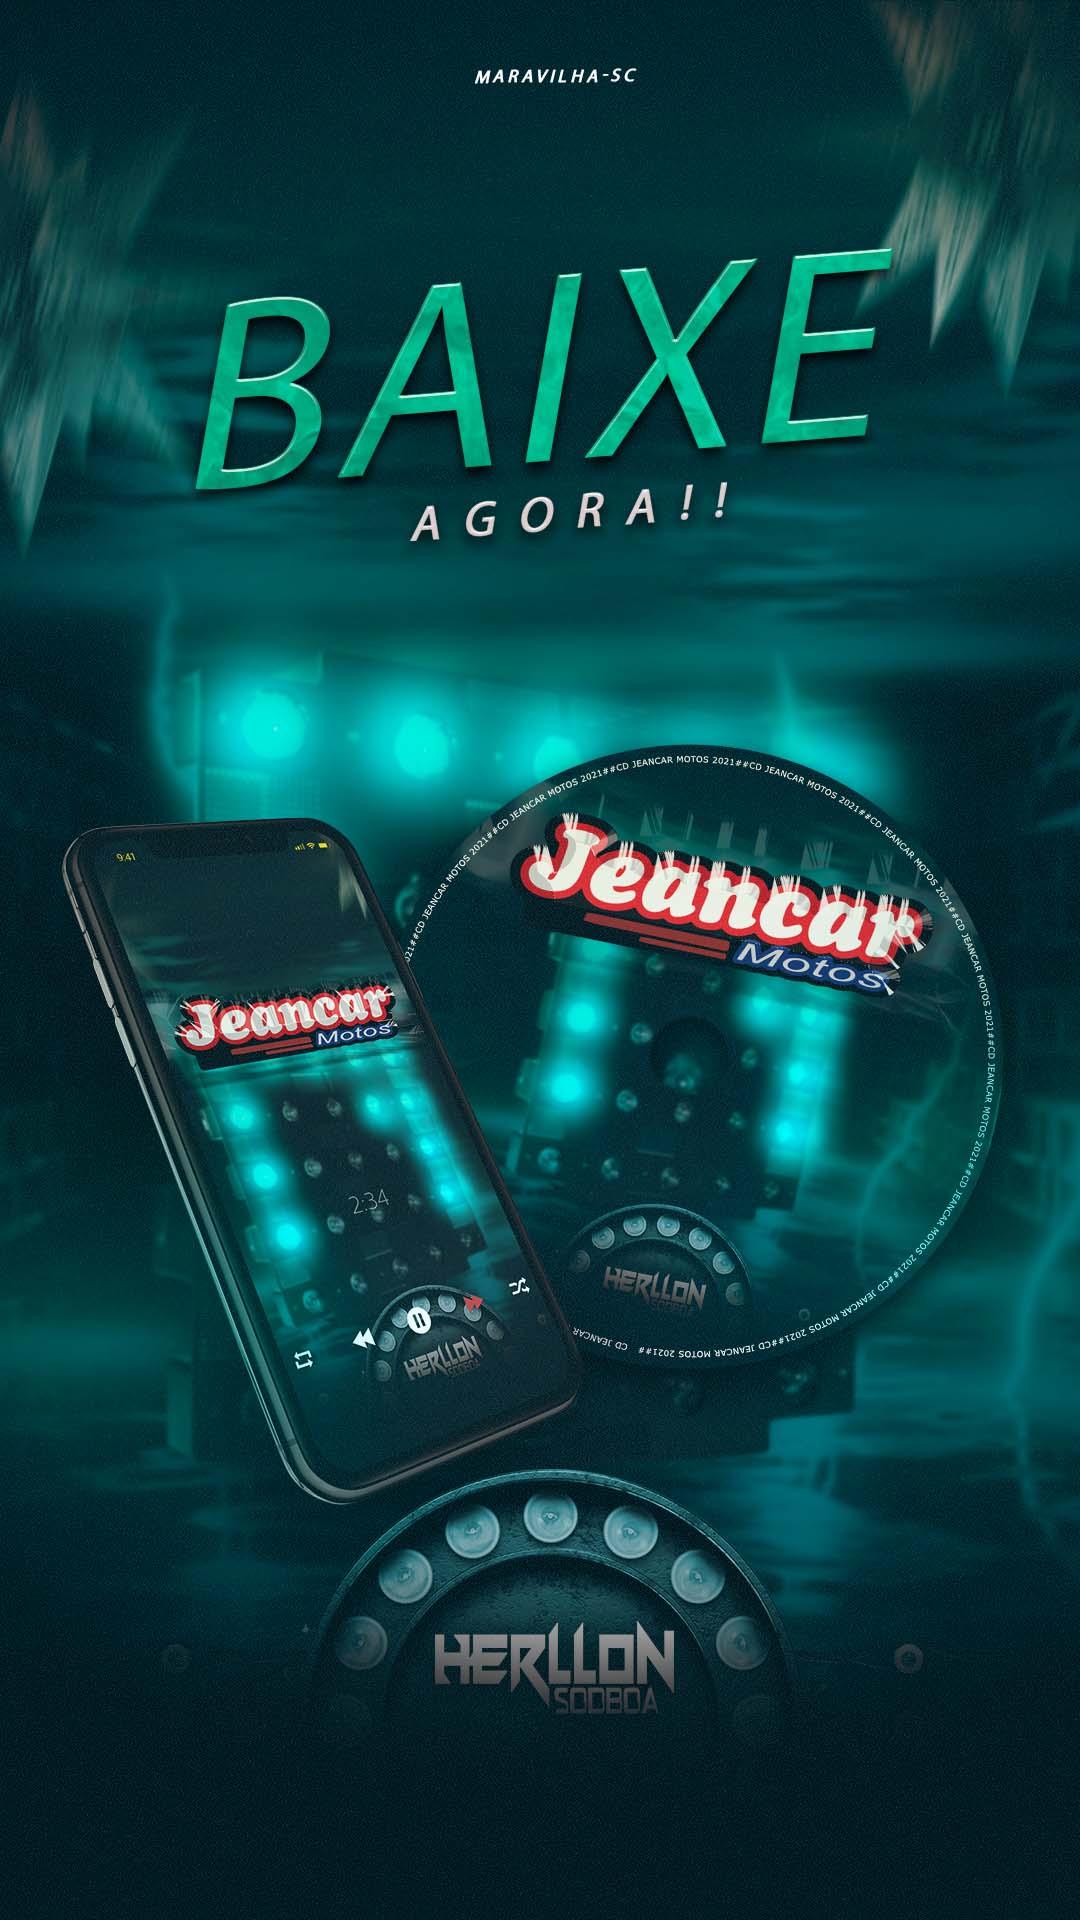 CD JEANCAR MOTOS 2021 DJ HERLLON SODBOA